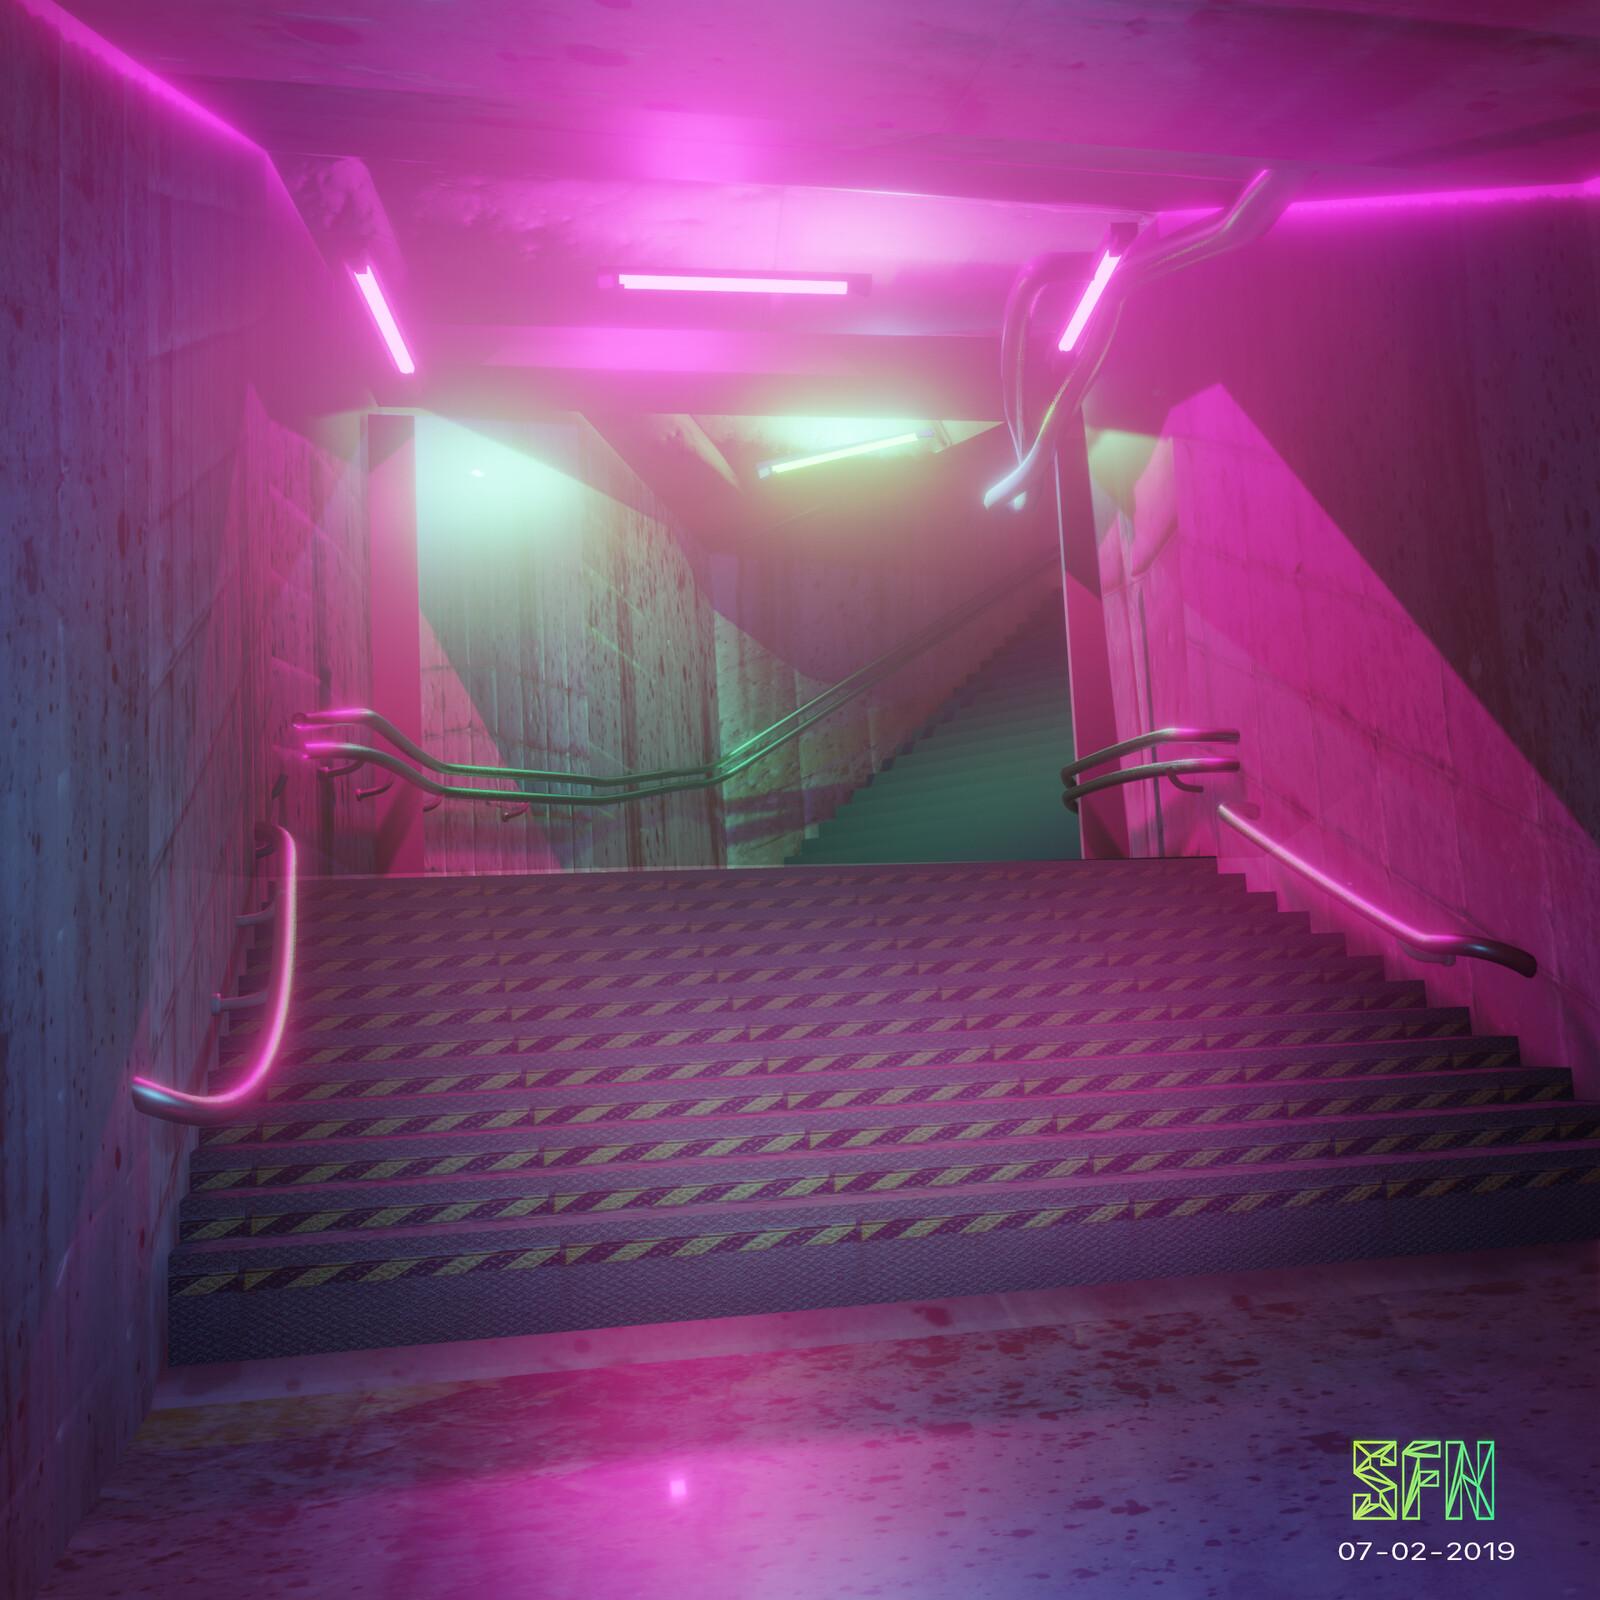 ArtStation - Neon Subway, Fina Nz